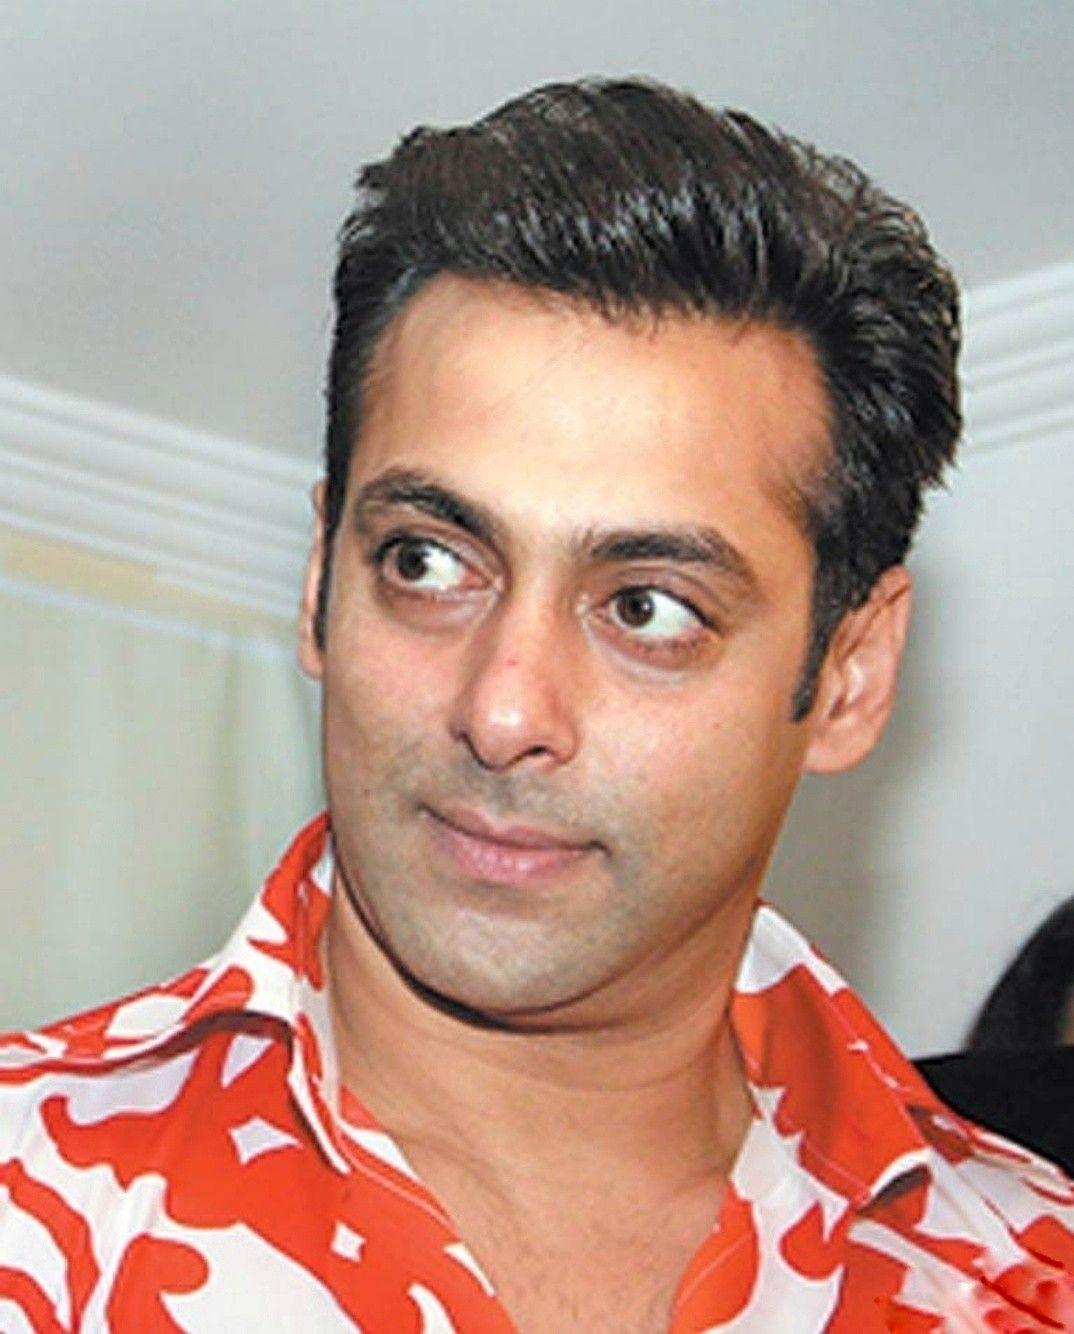 Salman Khan New Haircut - Haircuts you'll be asking for in ...